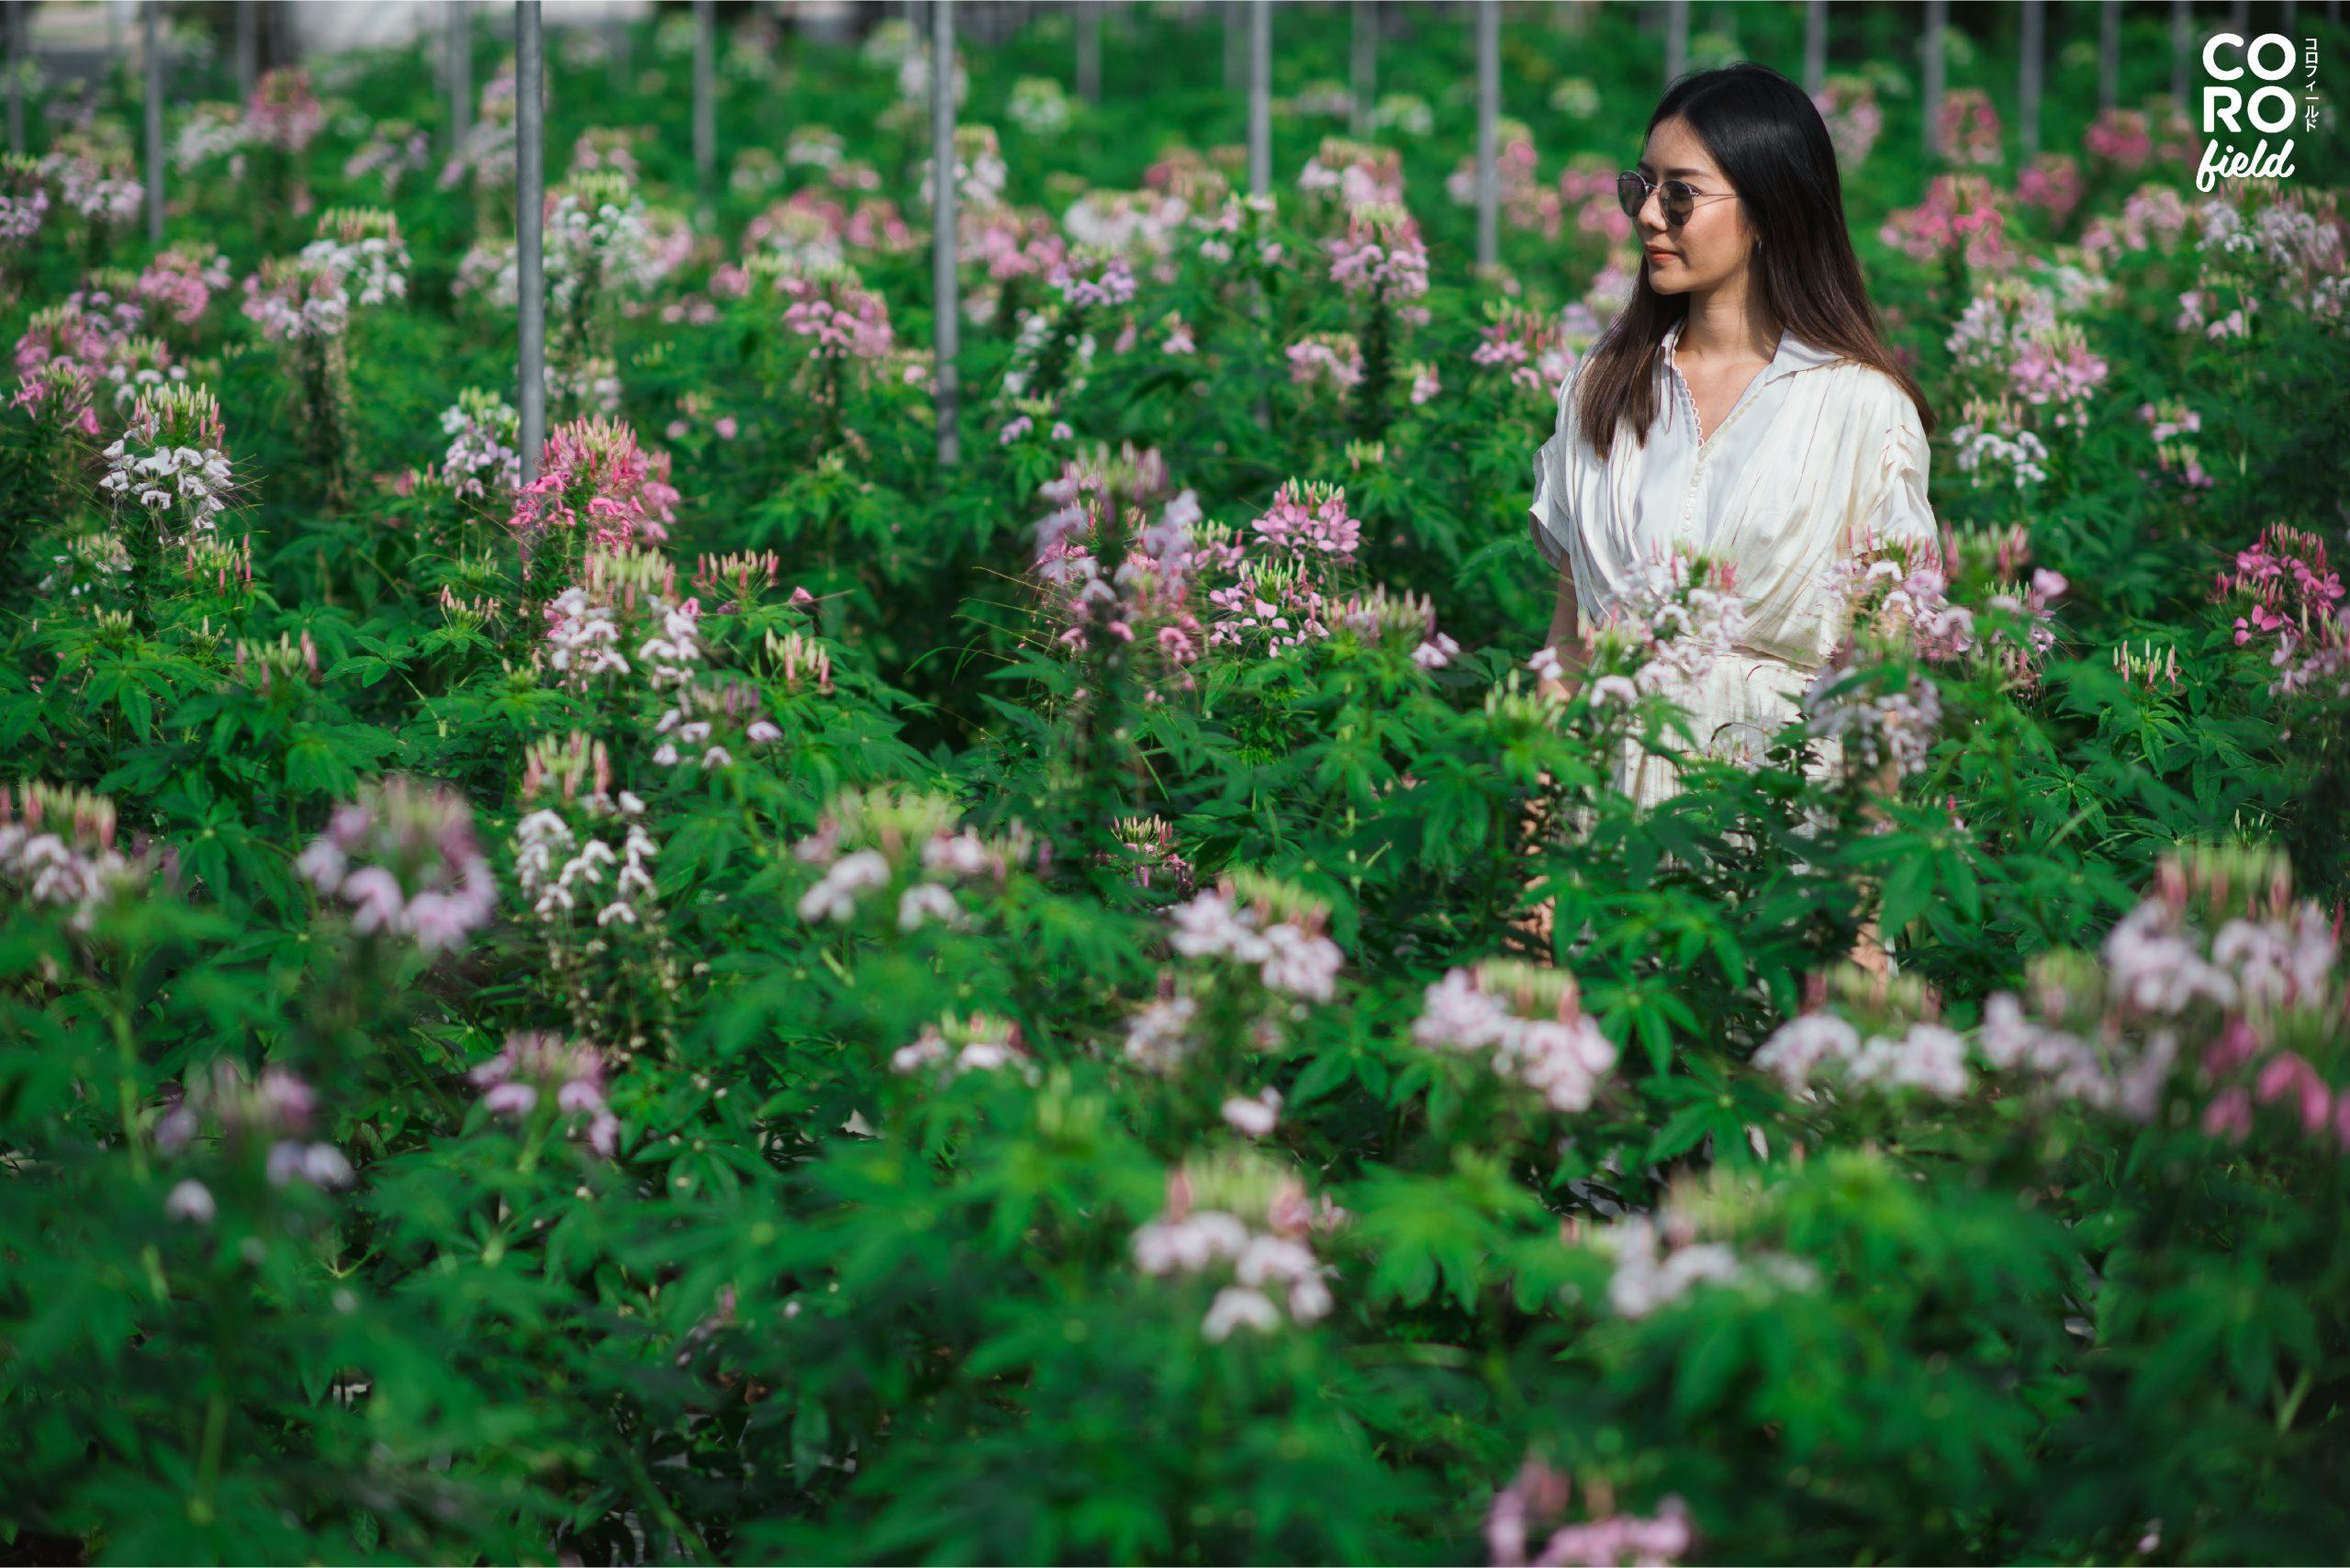 Coro Field ท่องเที่ยวเชิงเกษตร ที่เที่ยวราชบุรี ที่เที่ยวสวนผึ้ง ทุ่งดอกไม้ เที่ยวราชบุรี เที่ยวสวนผึ้ง